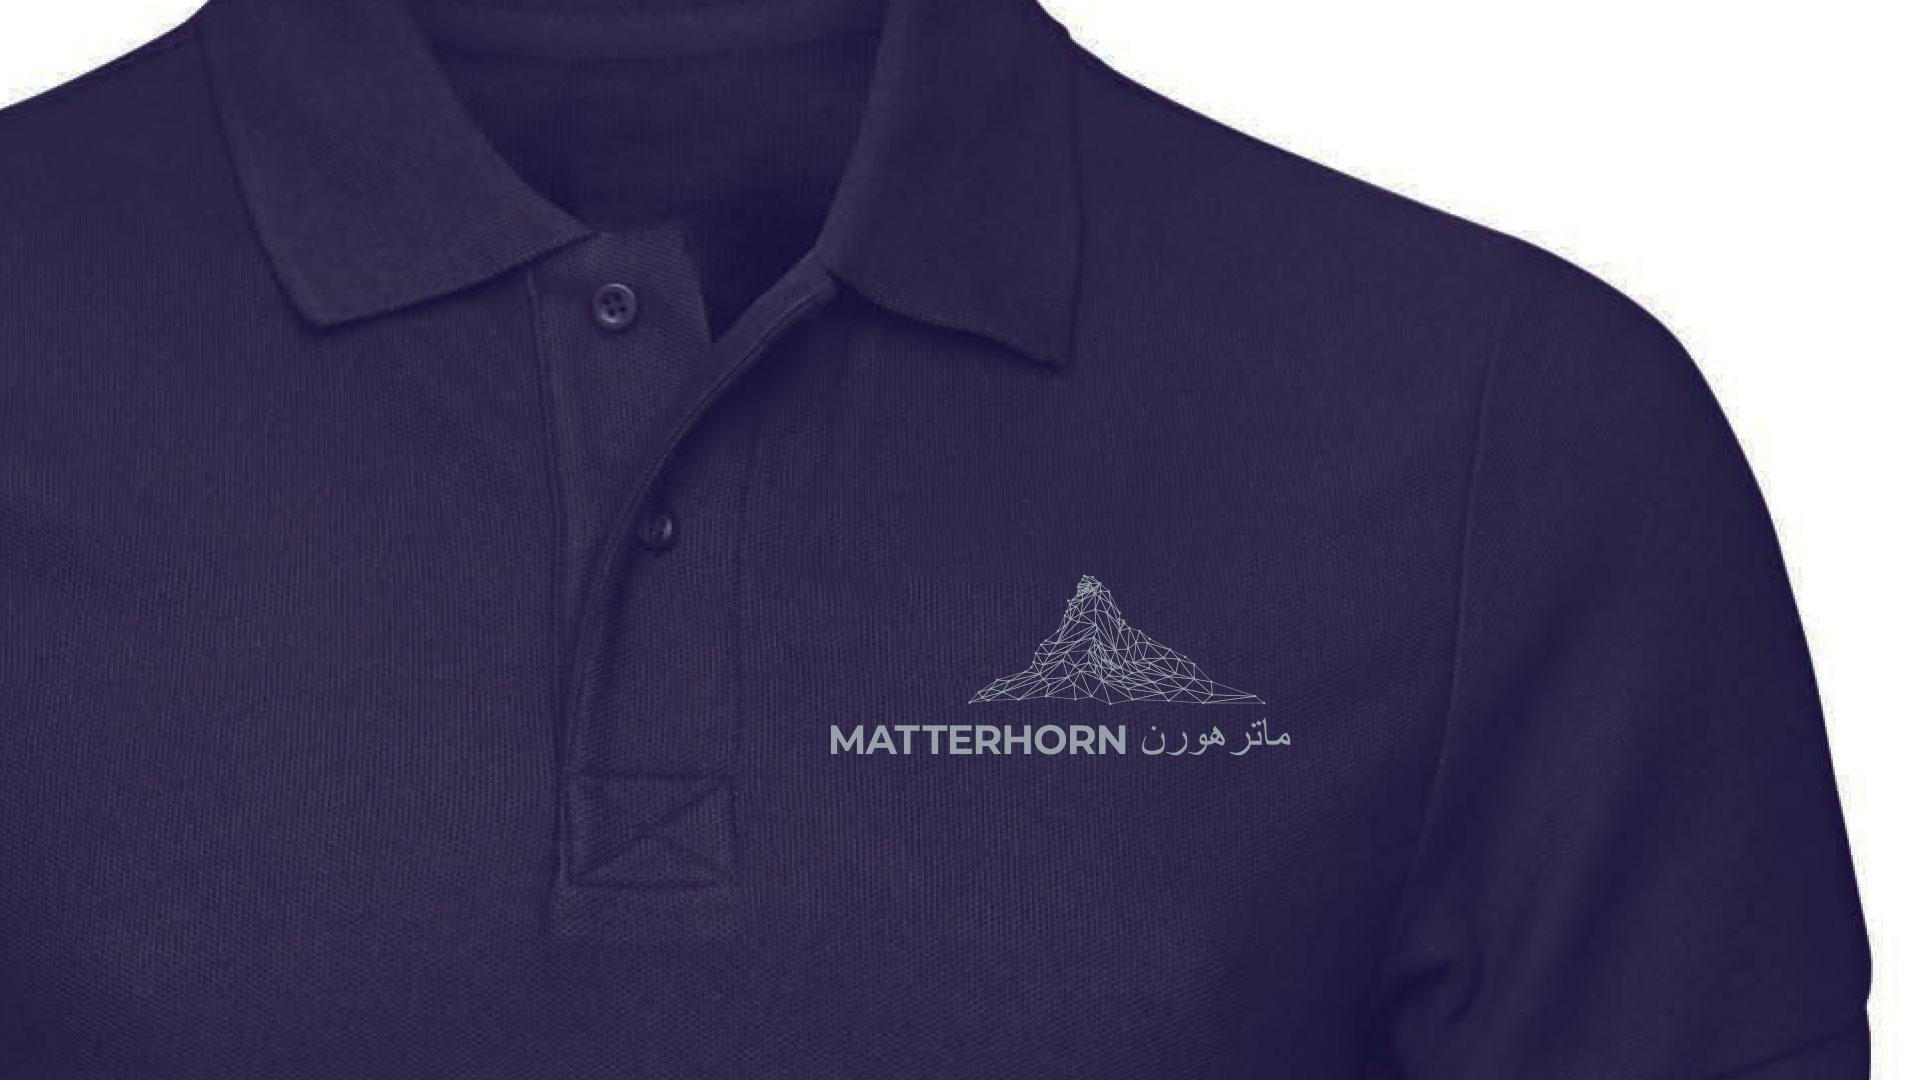 matterhorn branded clothing